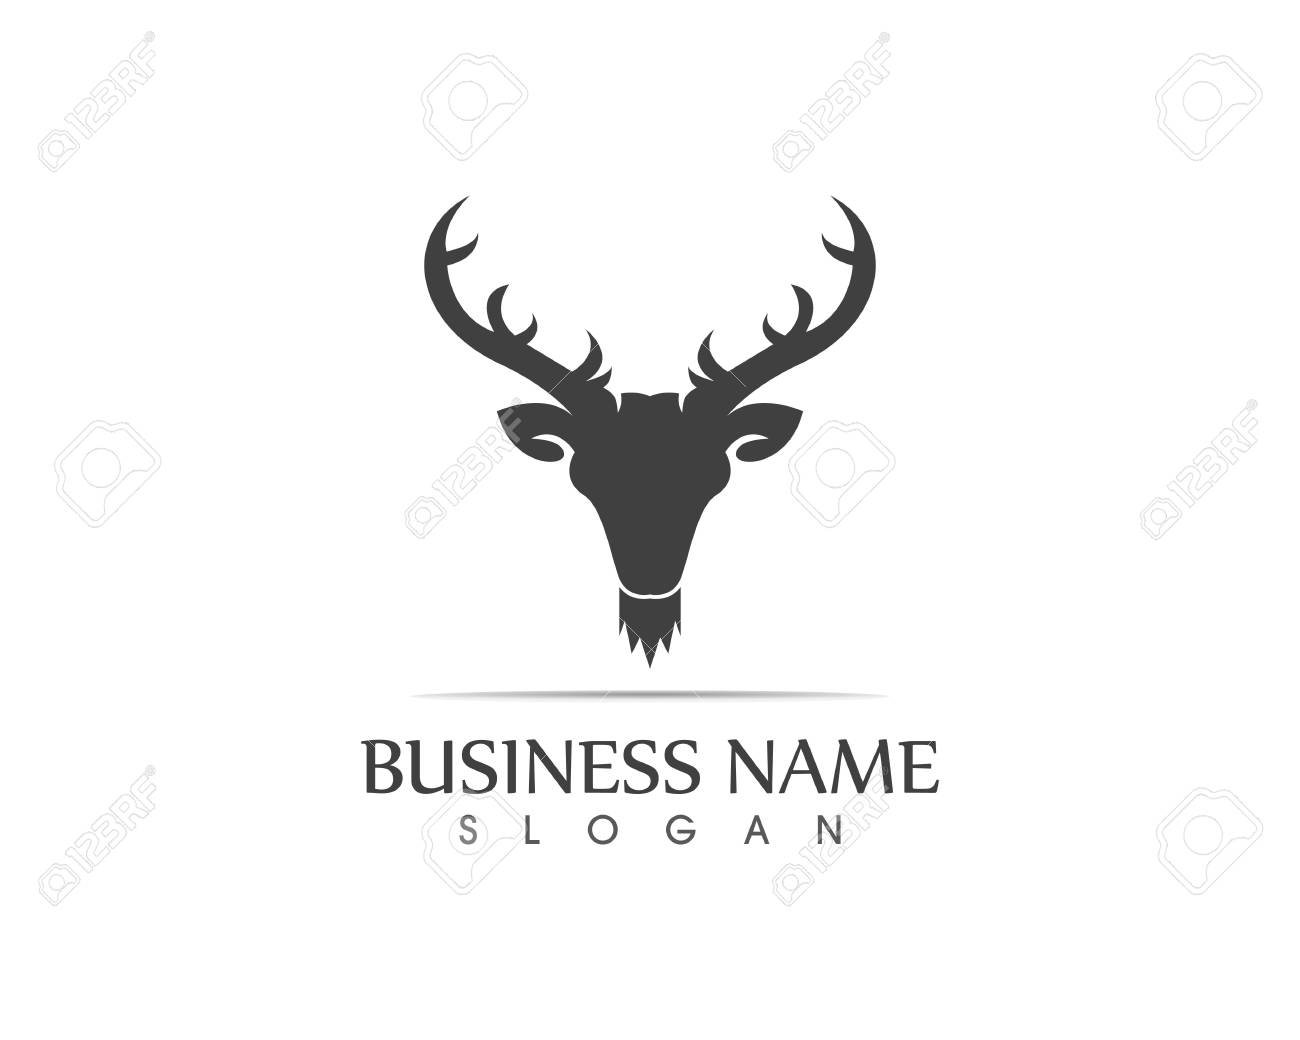 Deer head silhouette logo design template